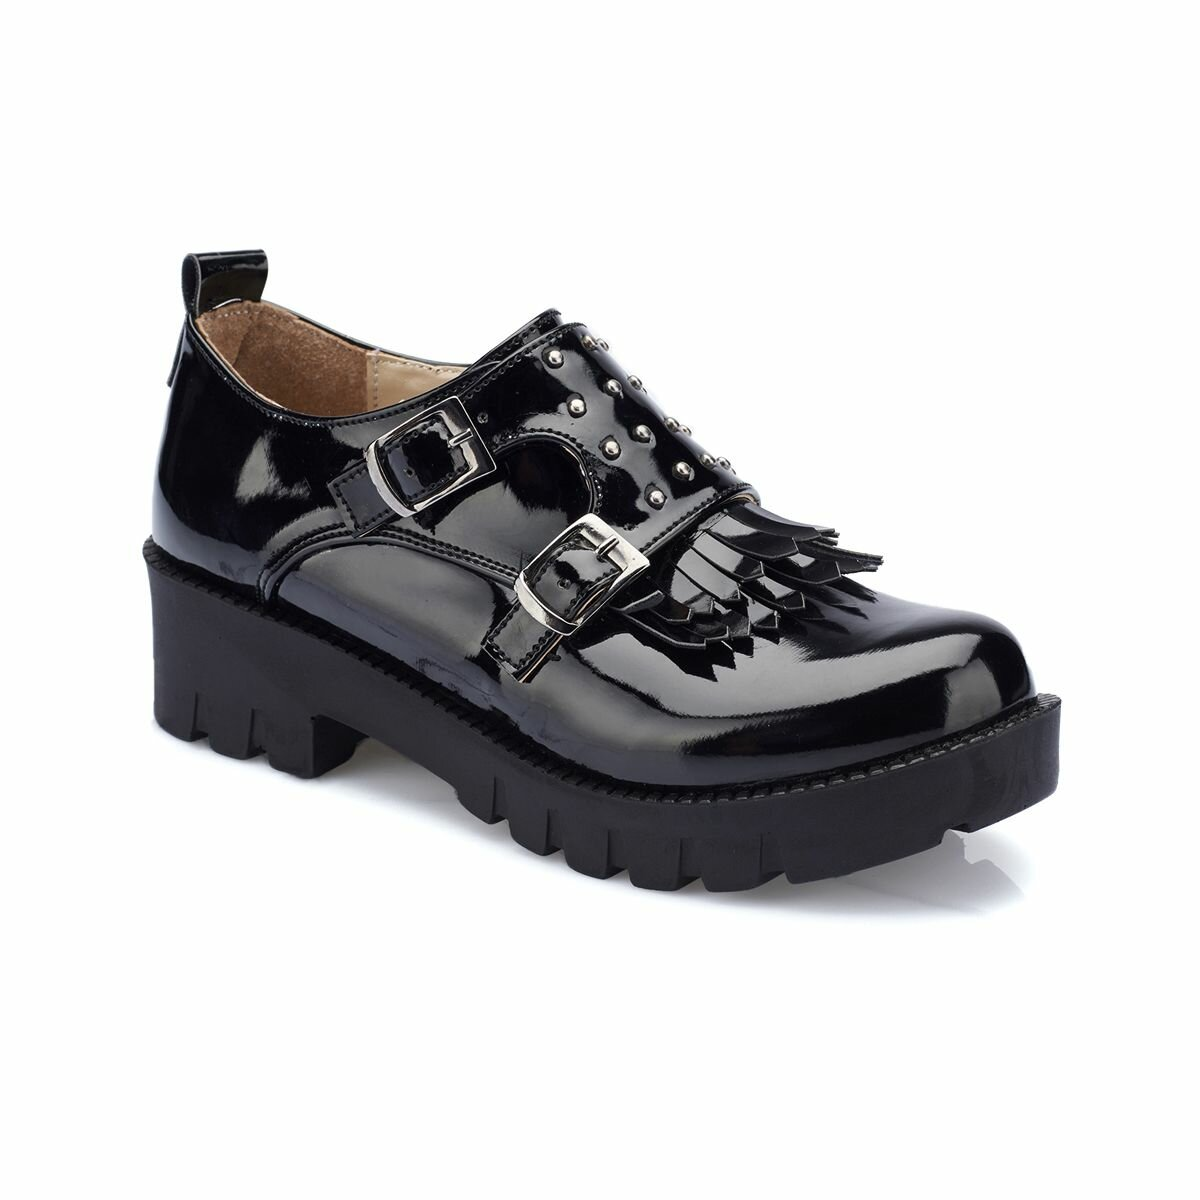 FLO 82.510948.F Black Female Child Shoes Polaris